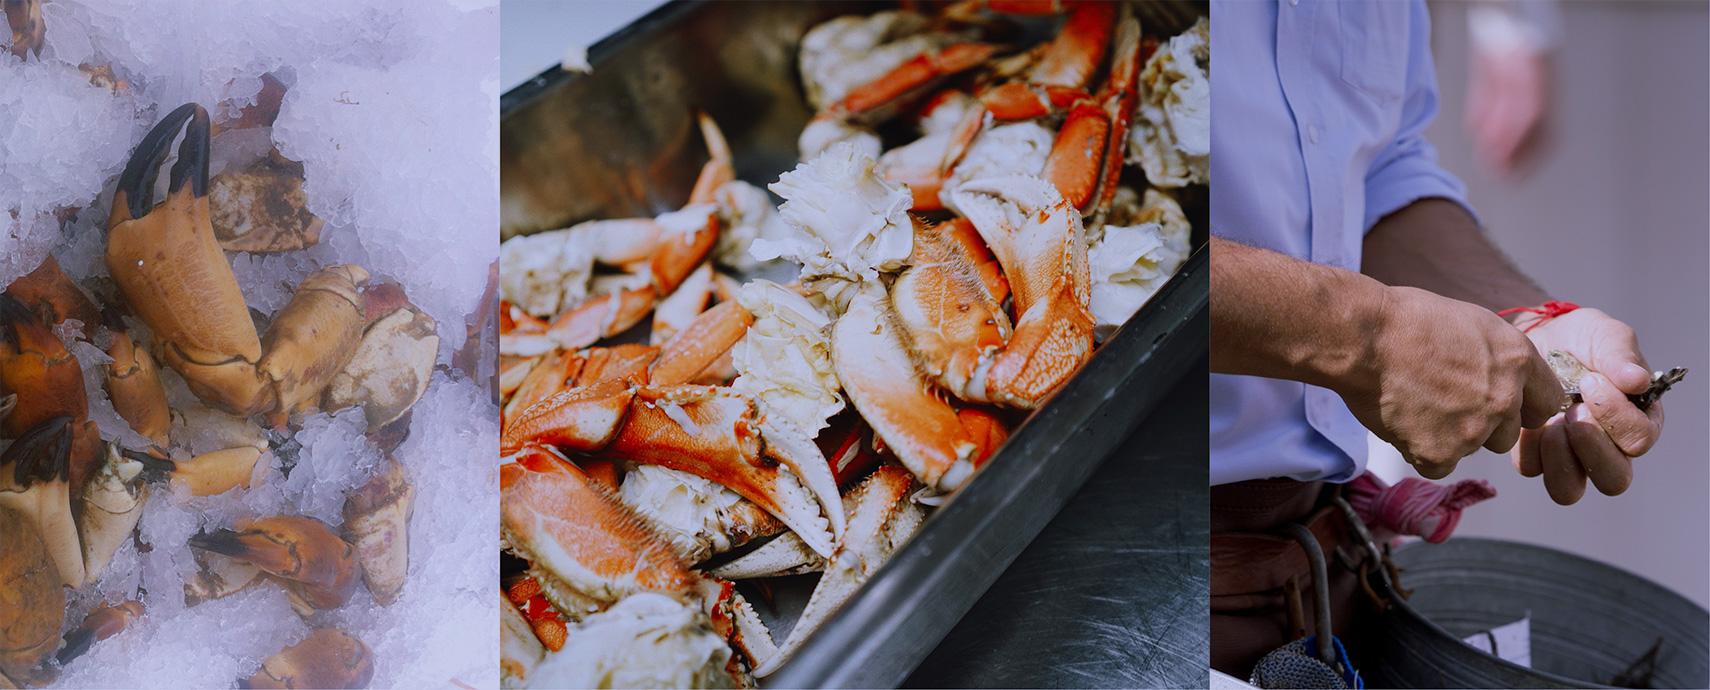 Oesterman Oesters feest Oesterproeverij bruiloft beurs bedrijfsfeest catering cateraar oesterman huren oesters openen